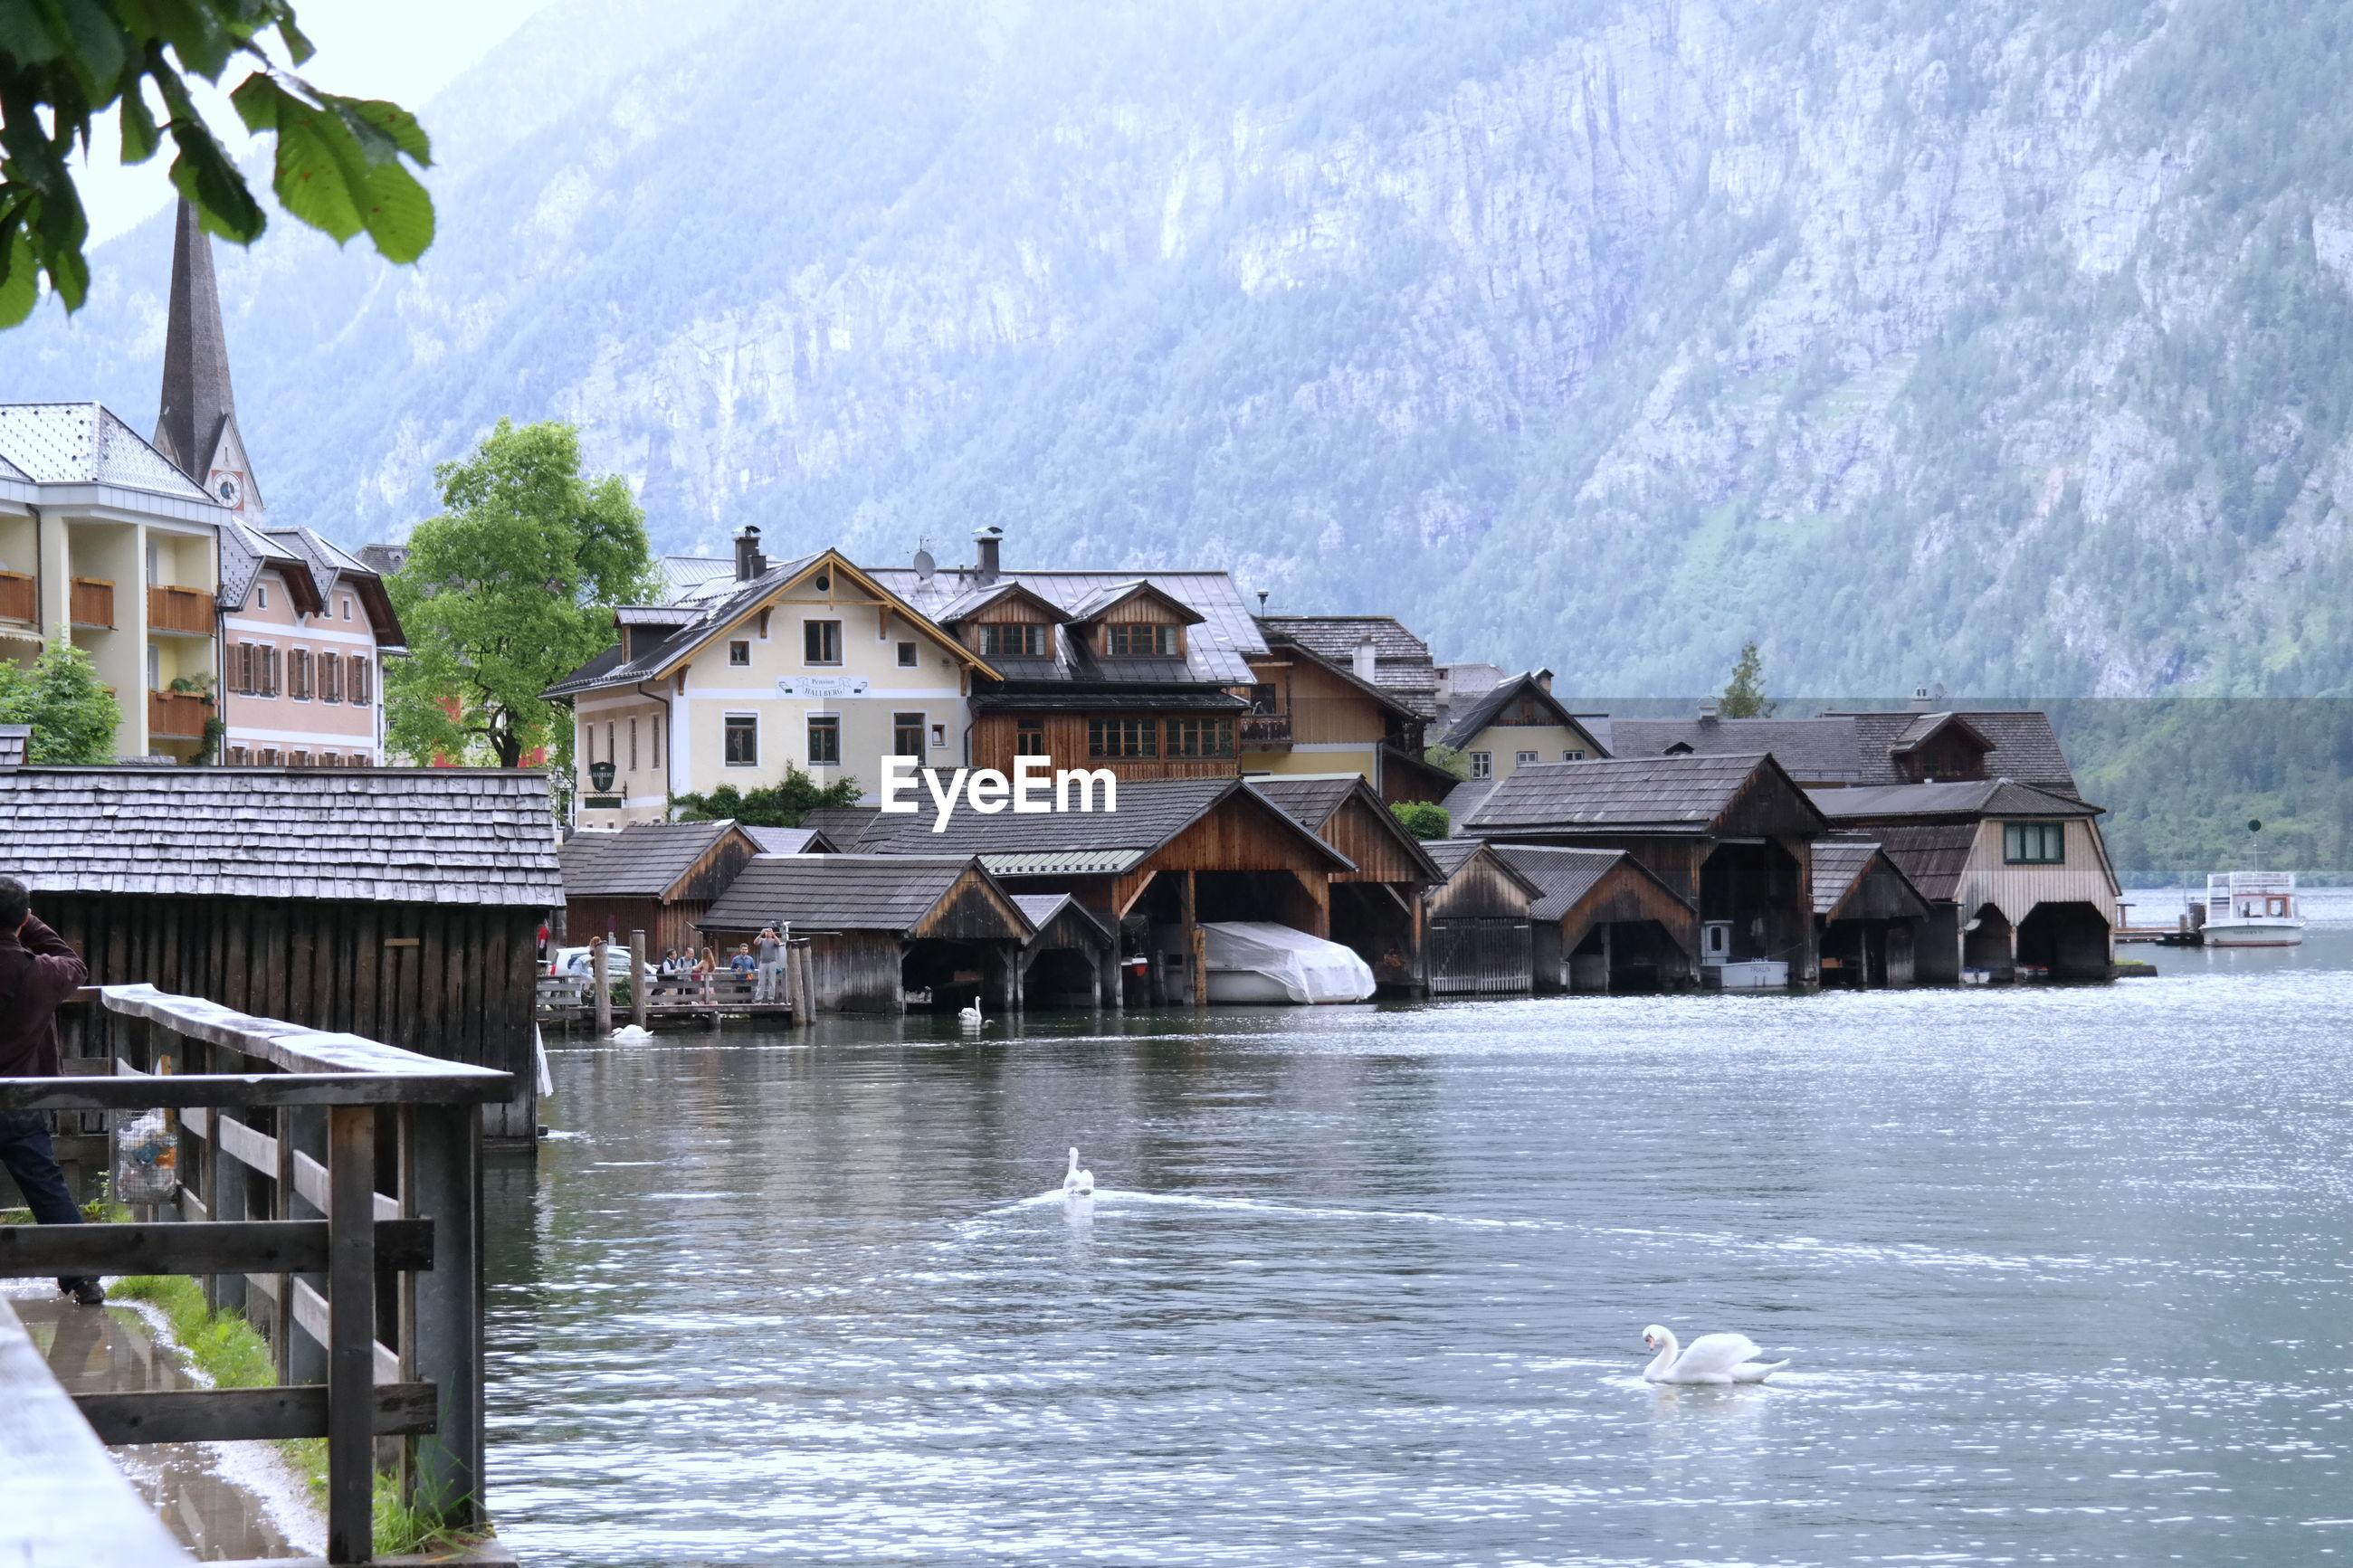 Swan swimming on lake hallstatt by village